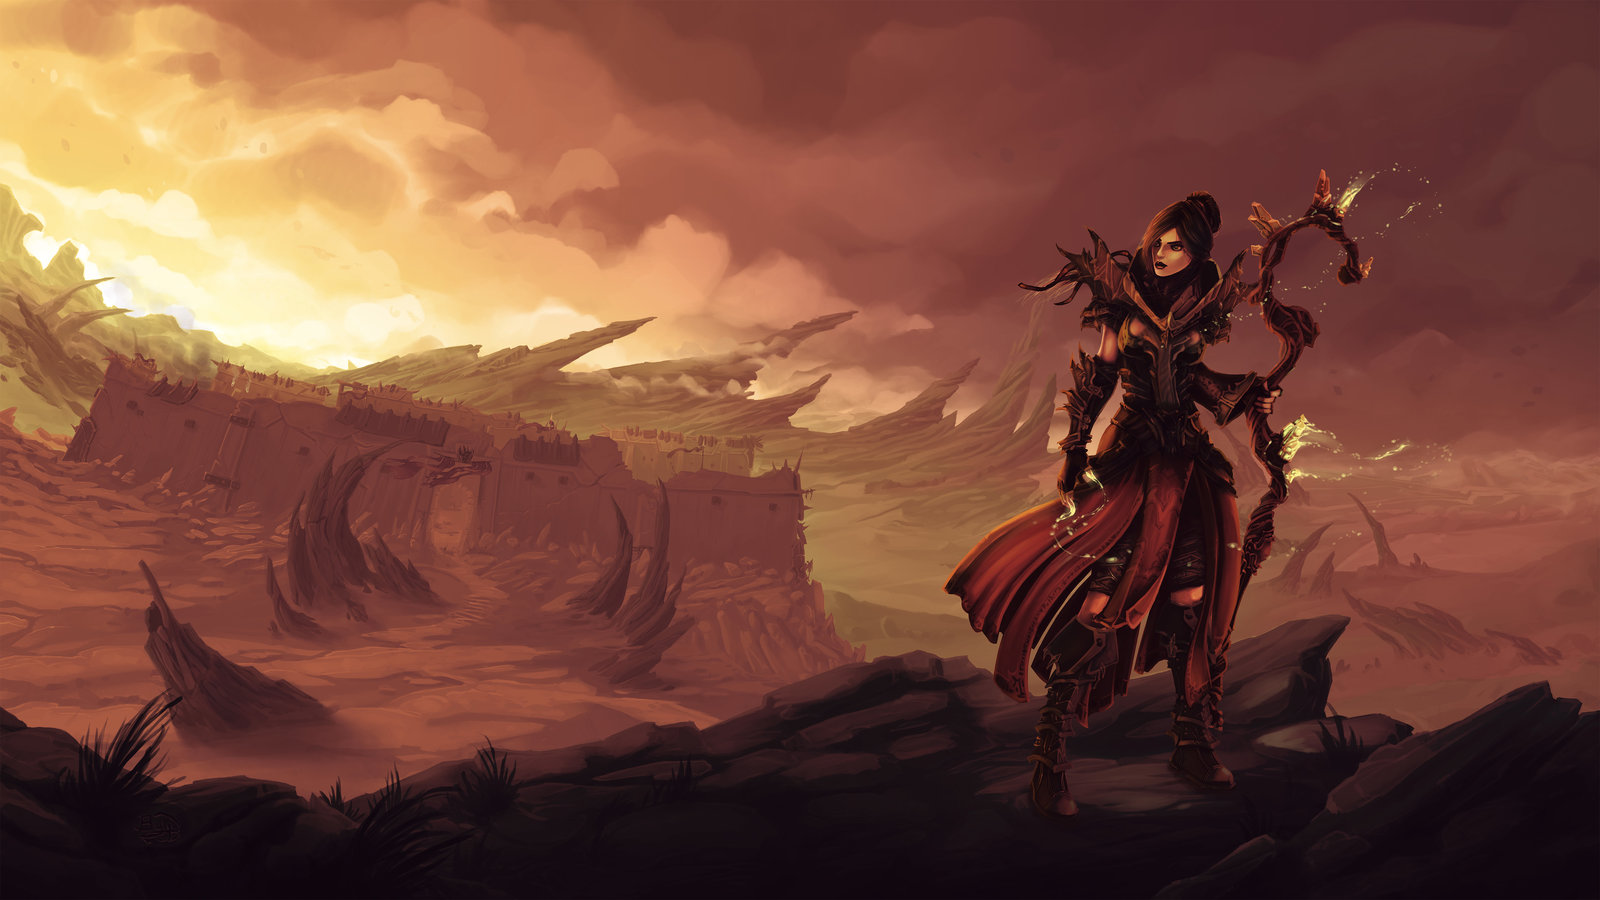 Aelya, Kehjistan's Sorceress